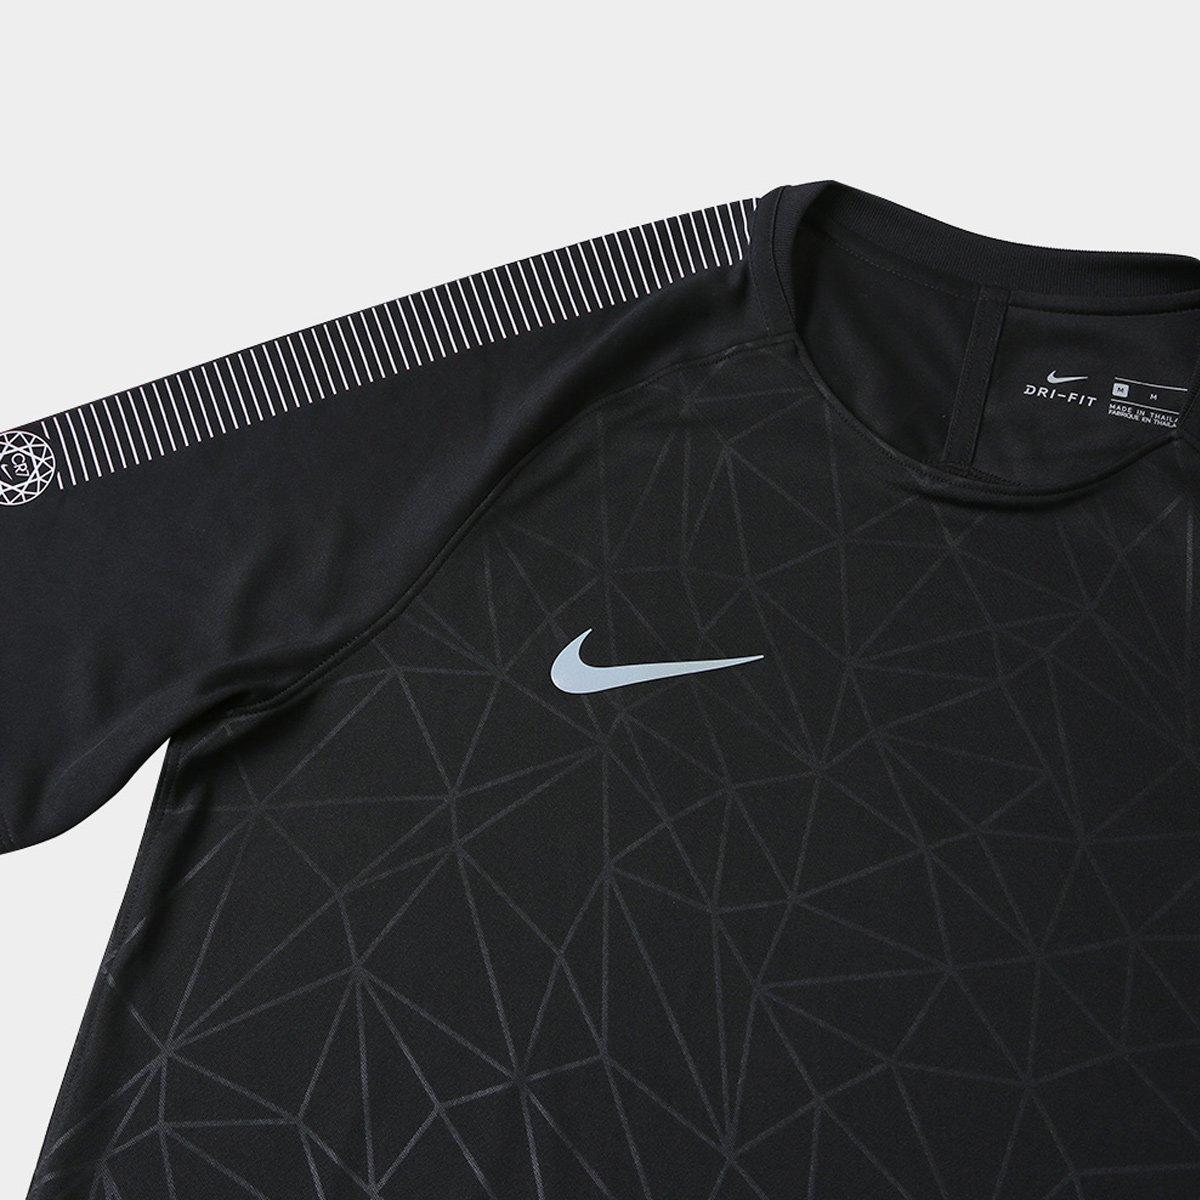 78c12a1bdc Camisa Nike CR7 Masculina - Compre Agora